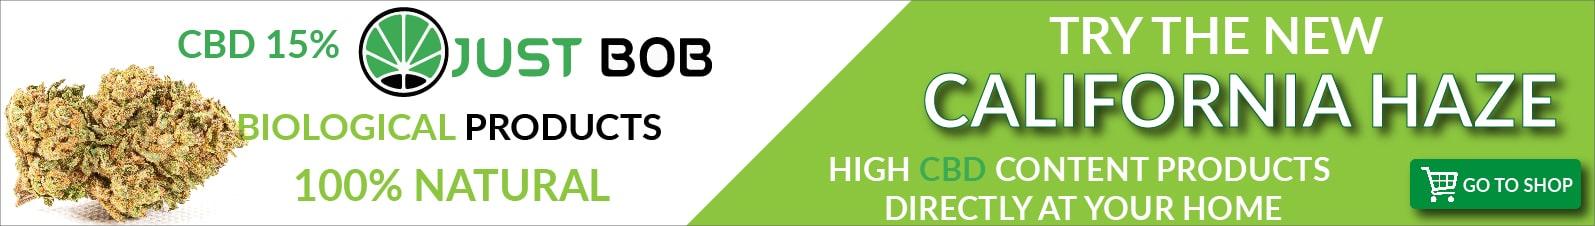 banner cbd online shop Justbob